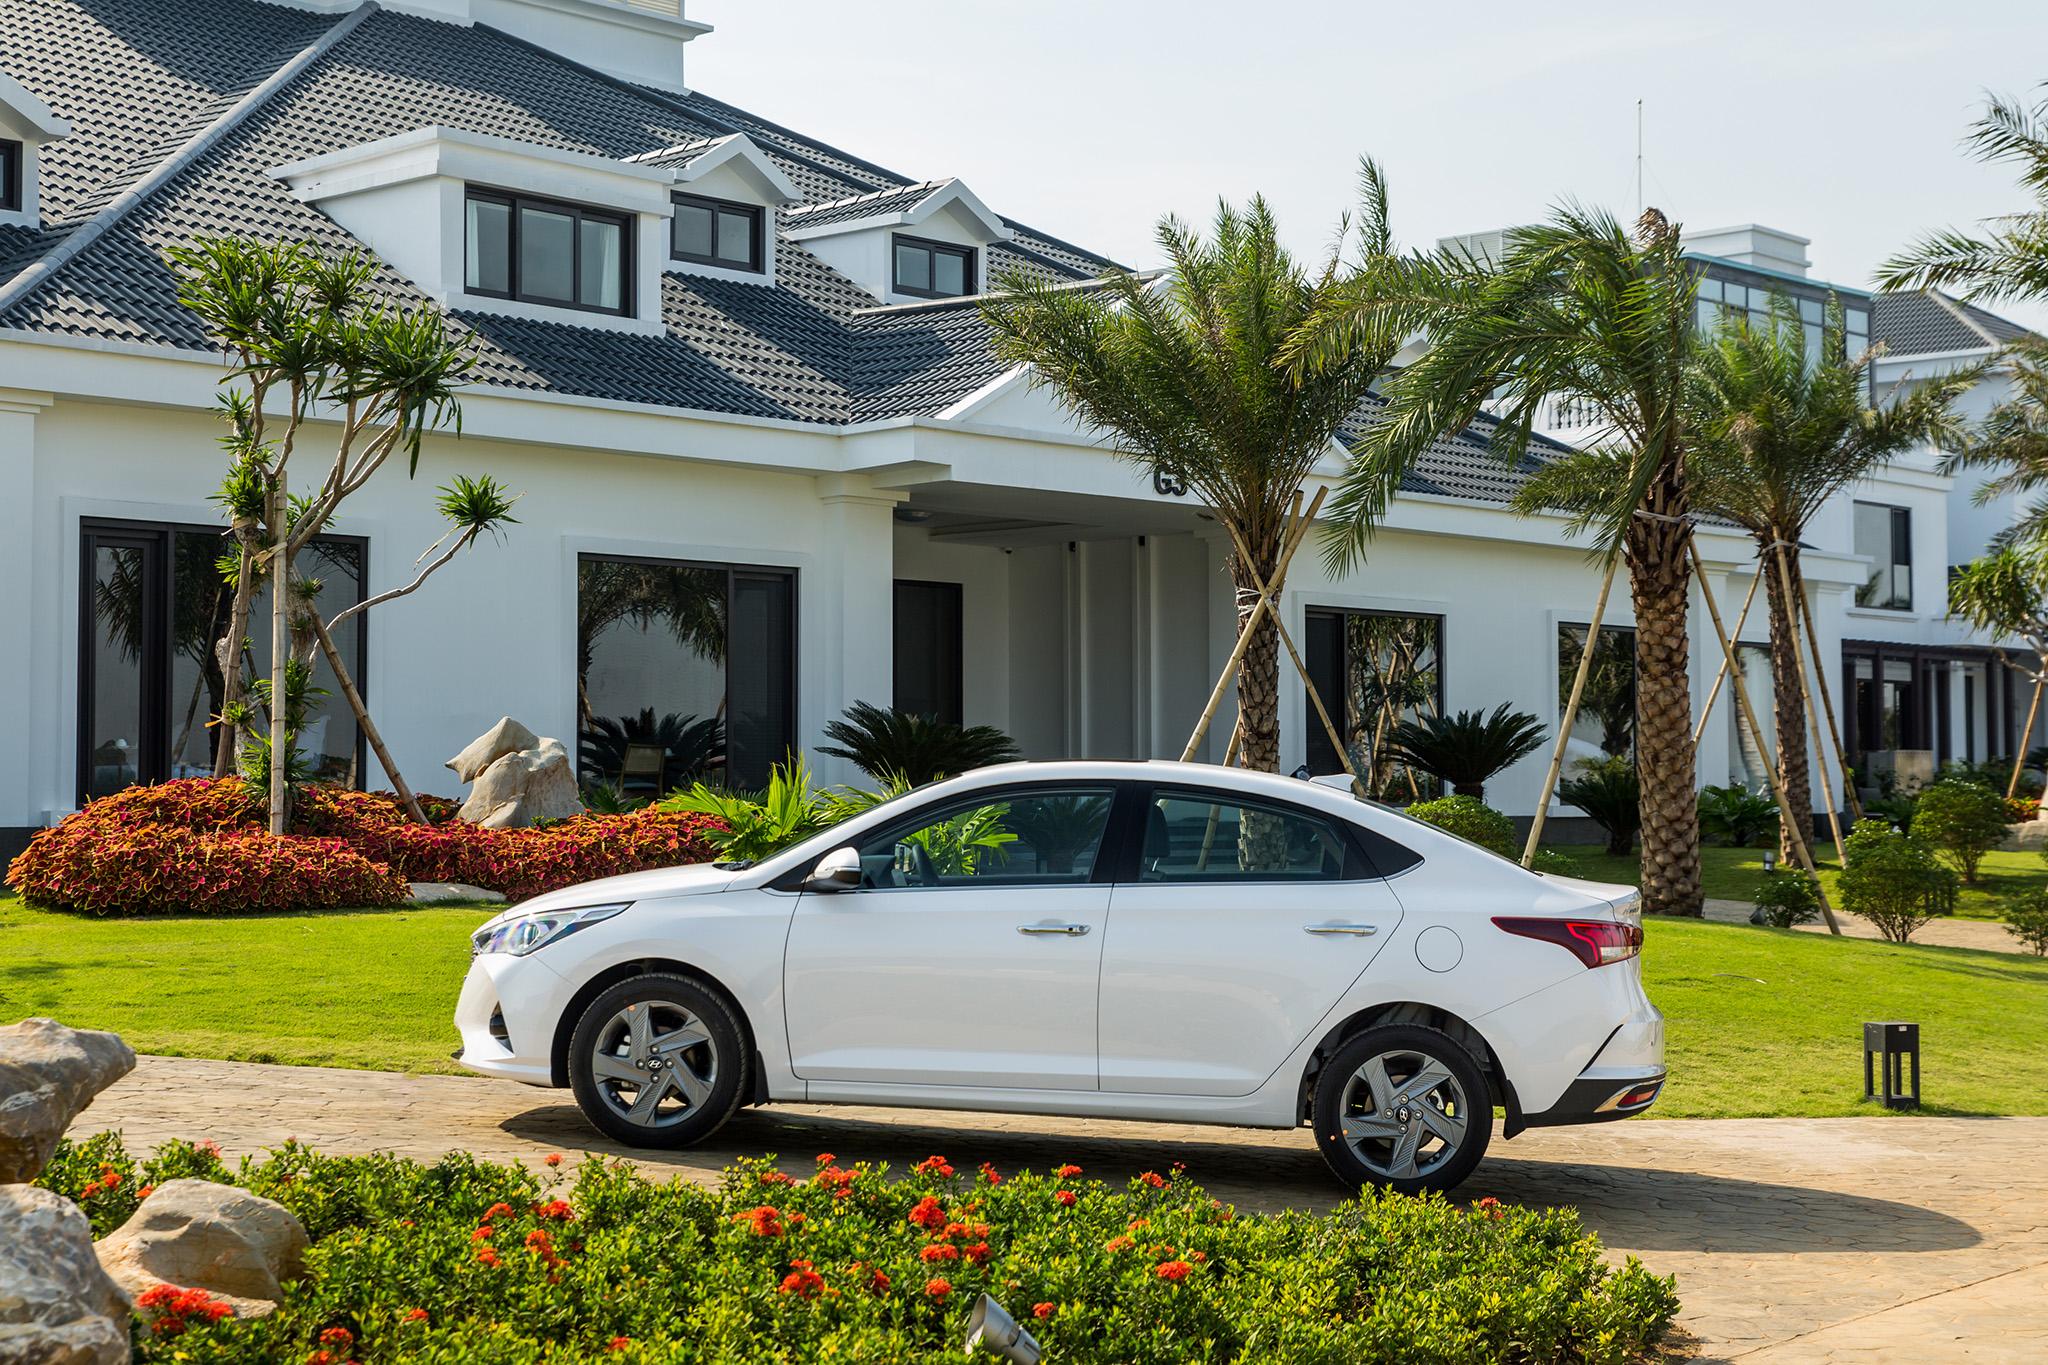 Hyundai Vinh giới thiệu Hyundai Accent 2021 giá từ 426,1 triệu đồng Hyundai-accent-2021-1